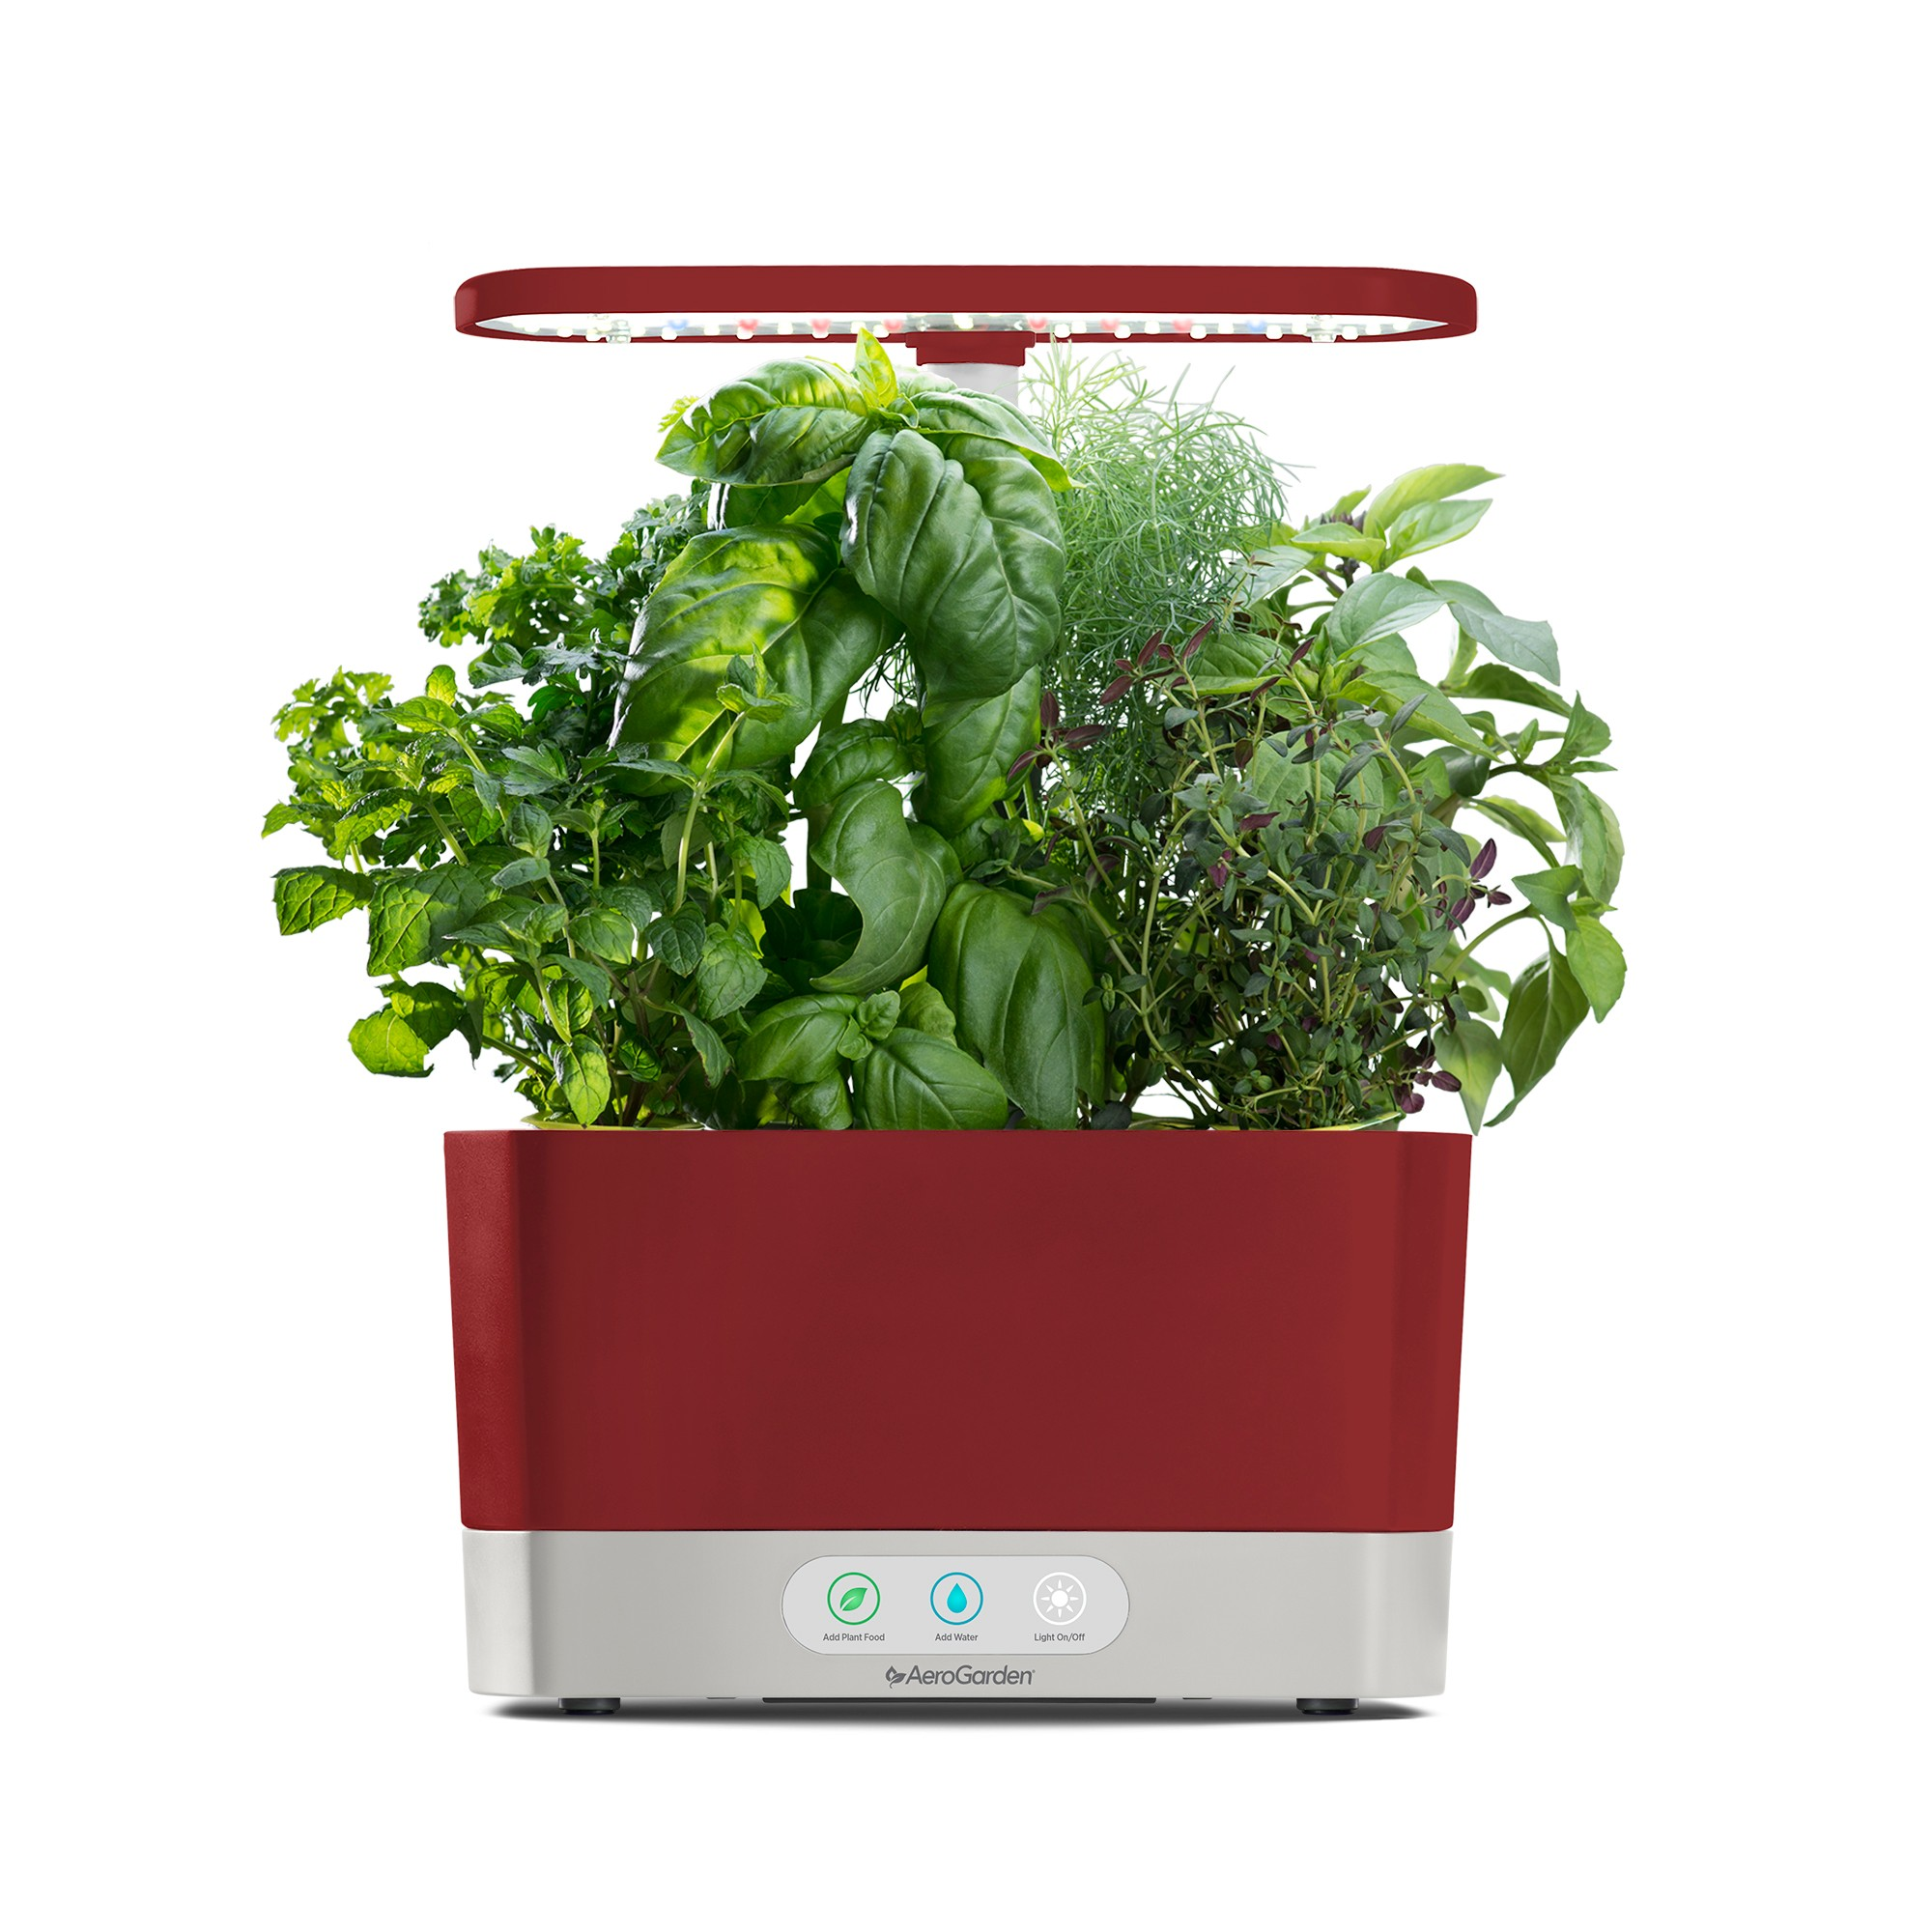 AeroGarden Harvest with Gourmet Herbs 6-Pod Seed Kit - Red